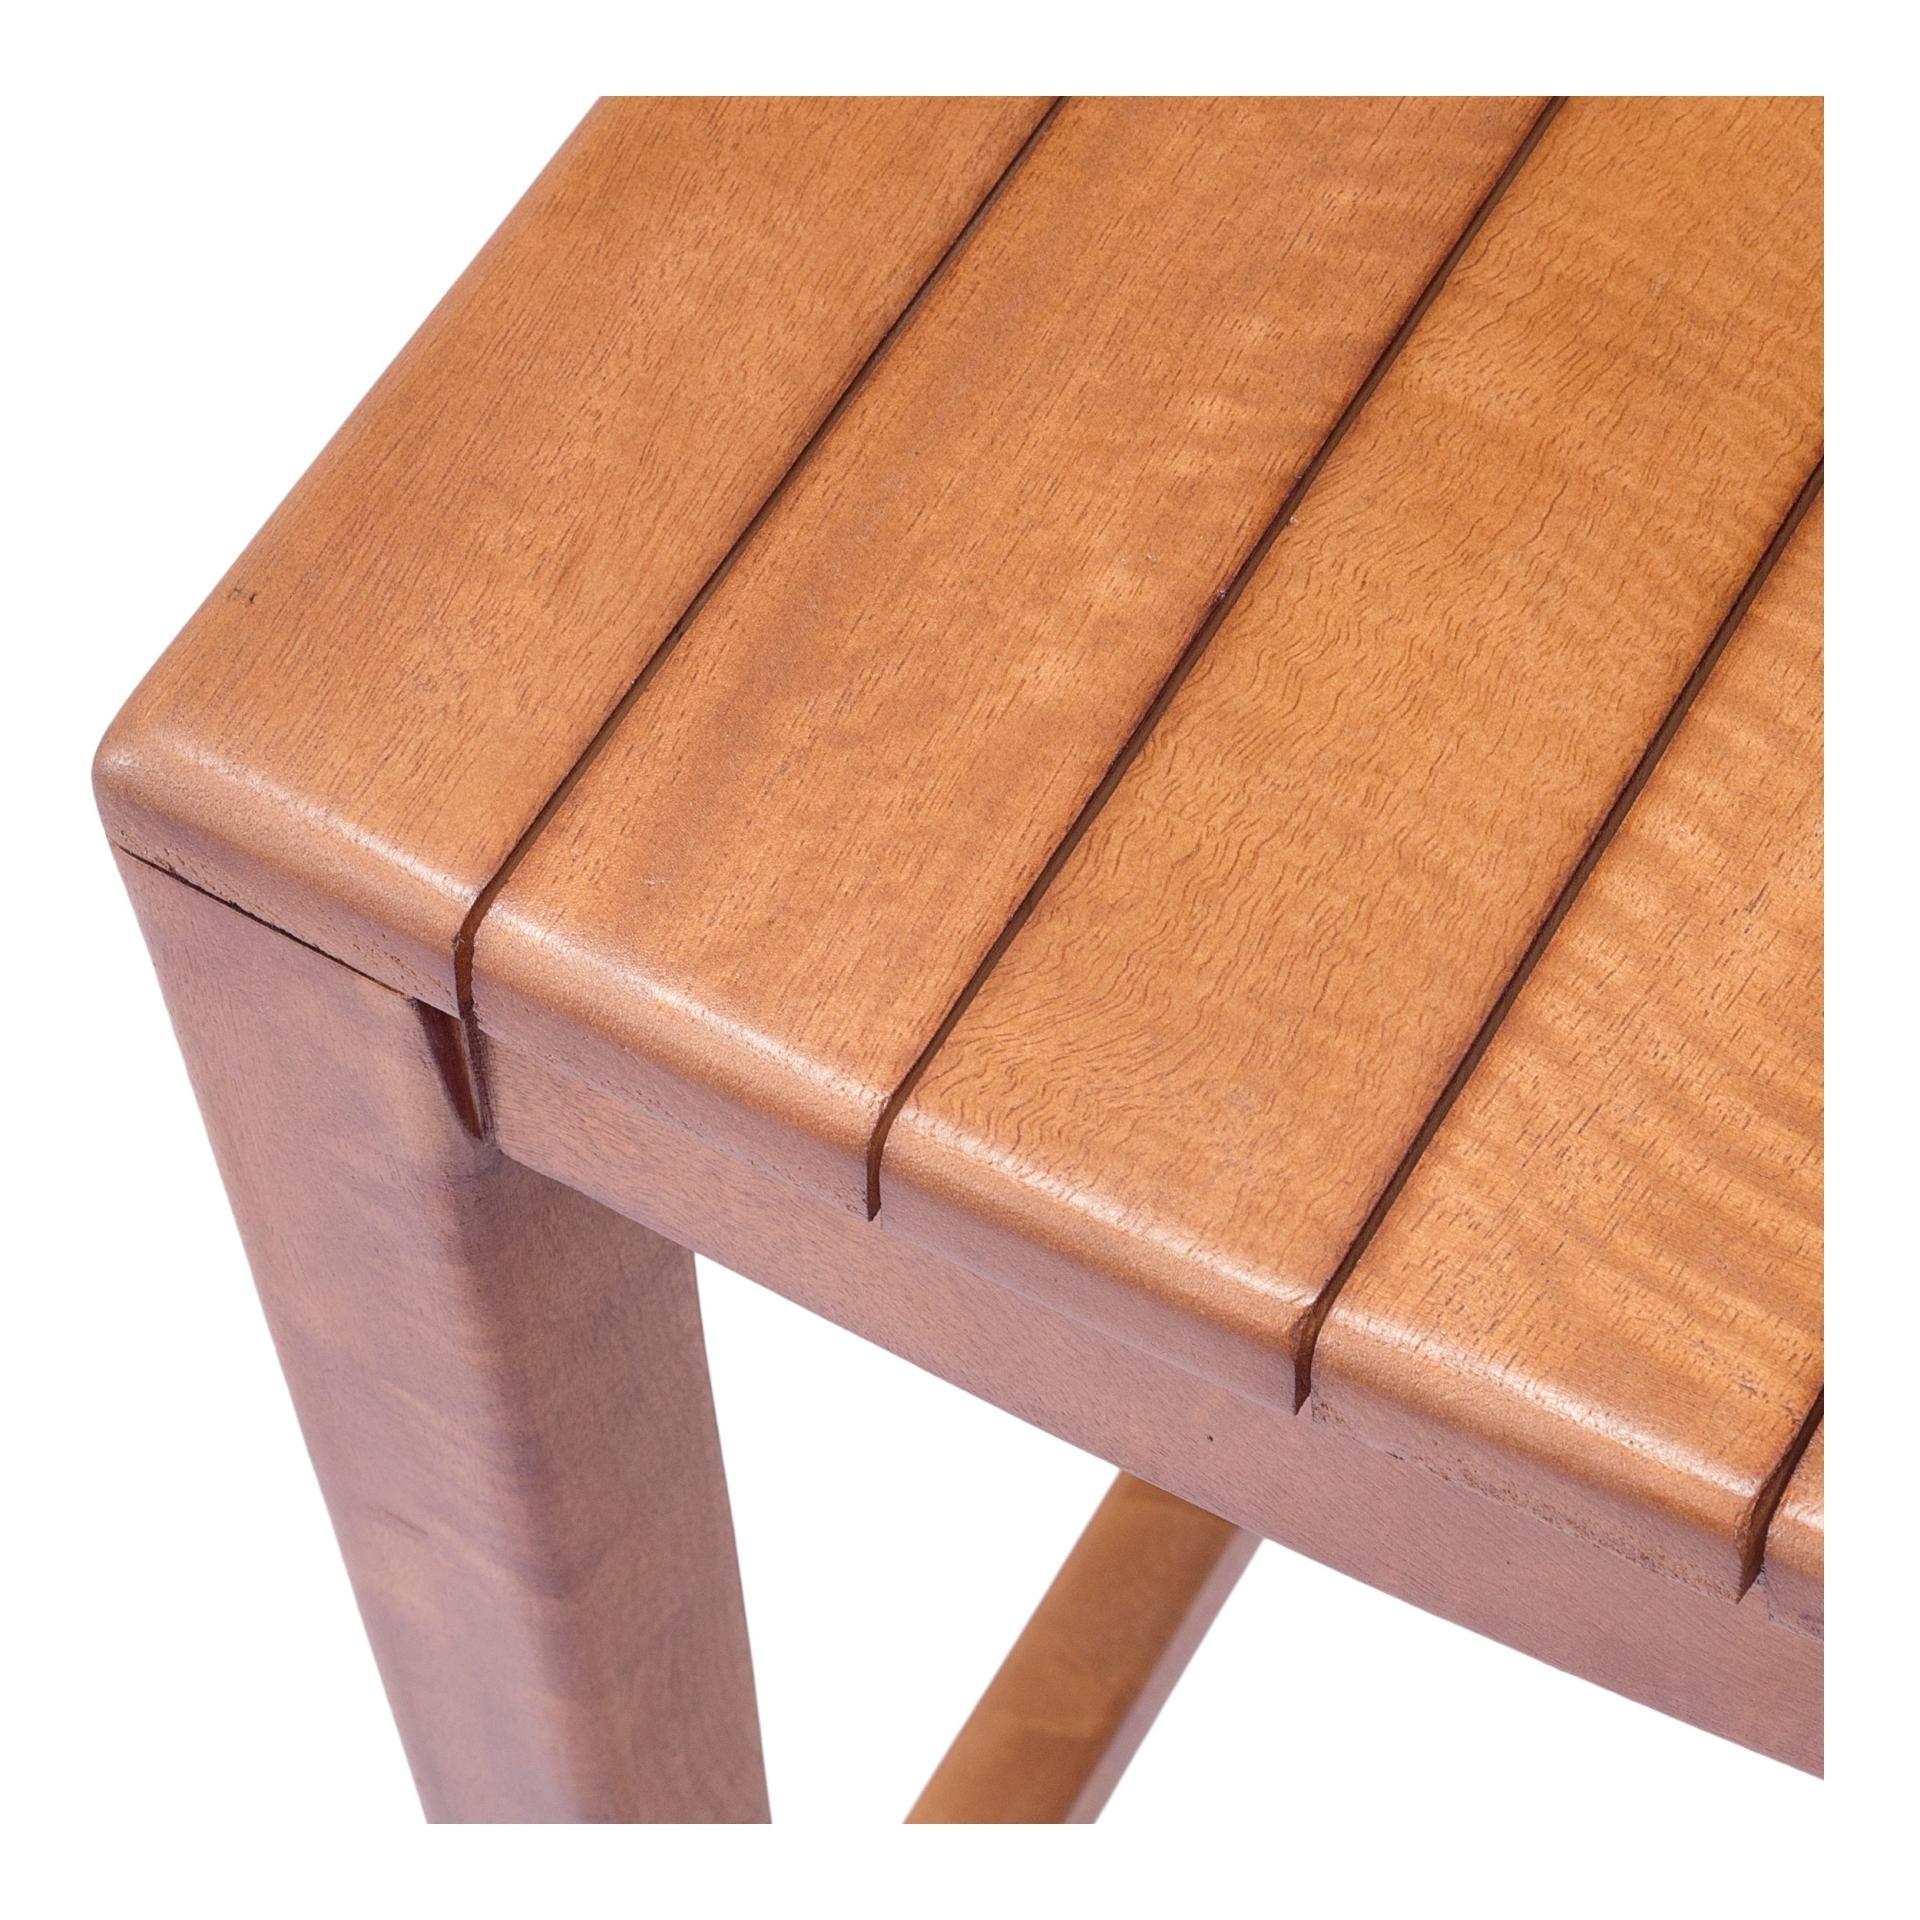 6600012 Npd Home Furniture Wholesale Lifestyle Furnishings